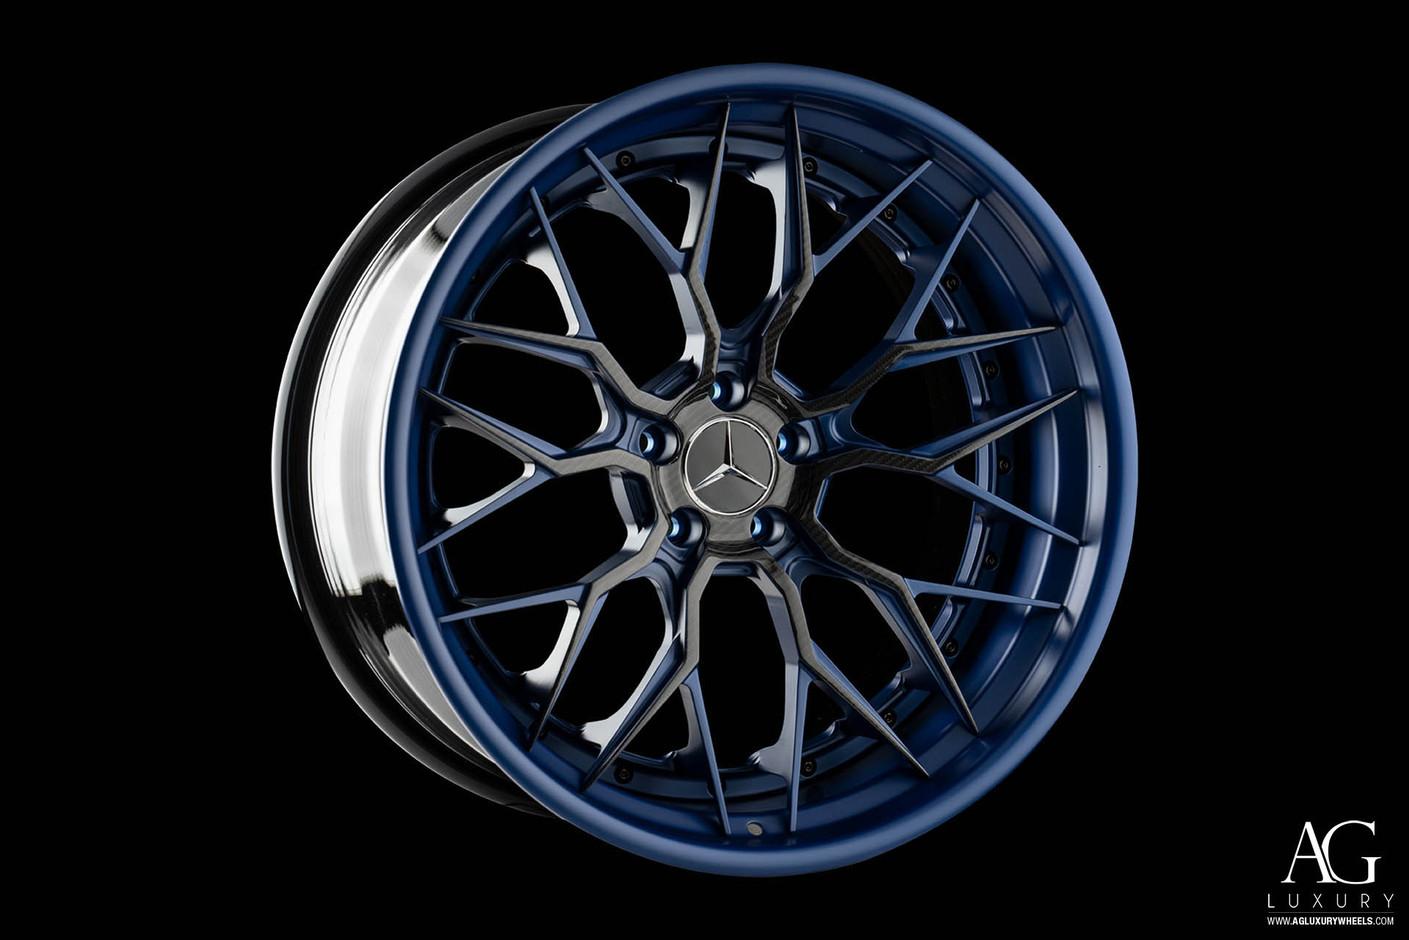 agluxury-wheels-agl43-spec3-carbon-fiber